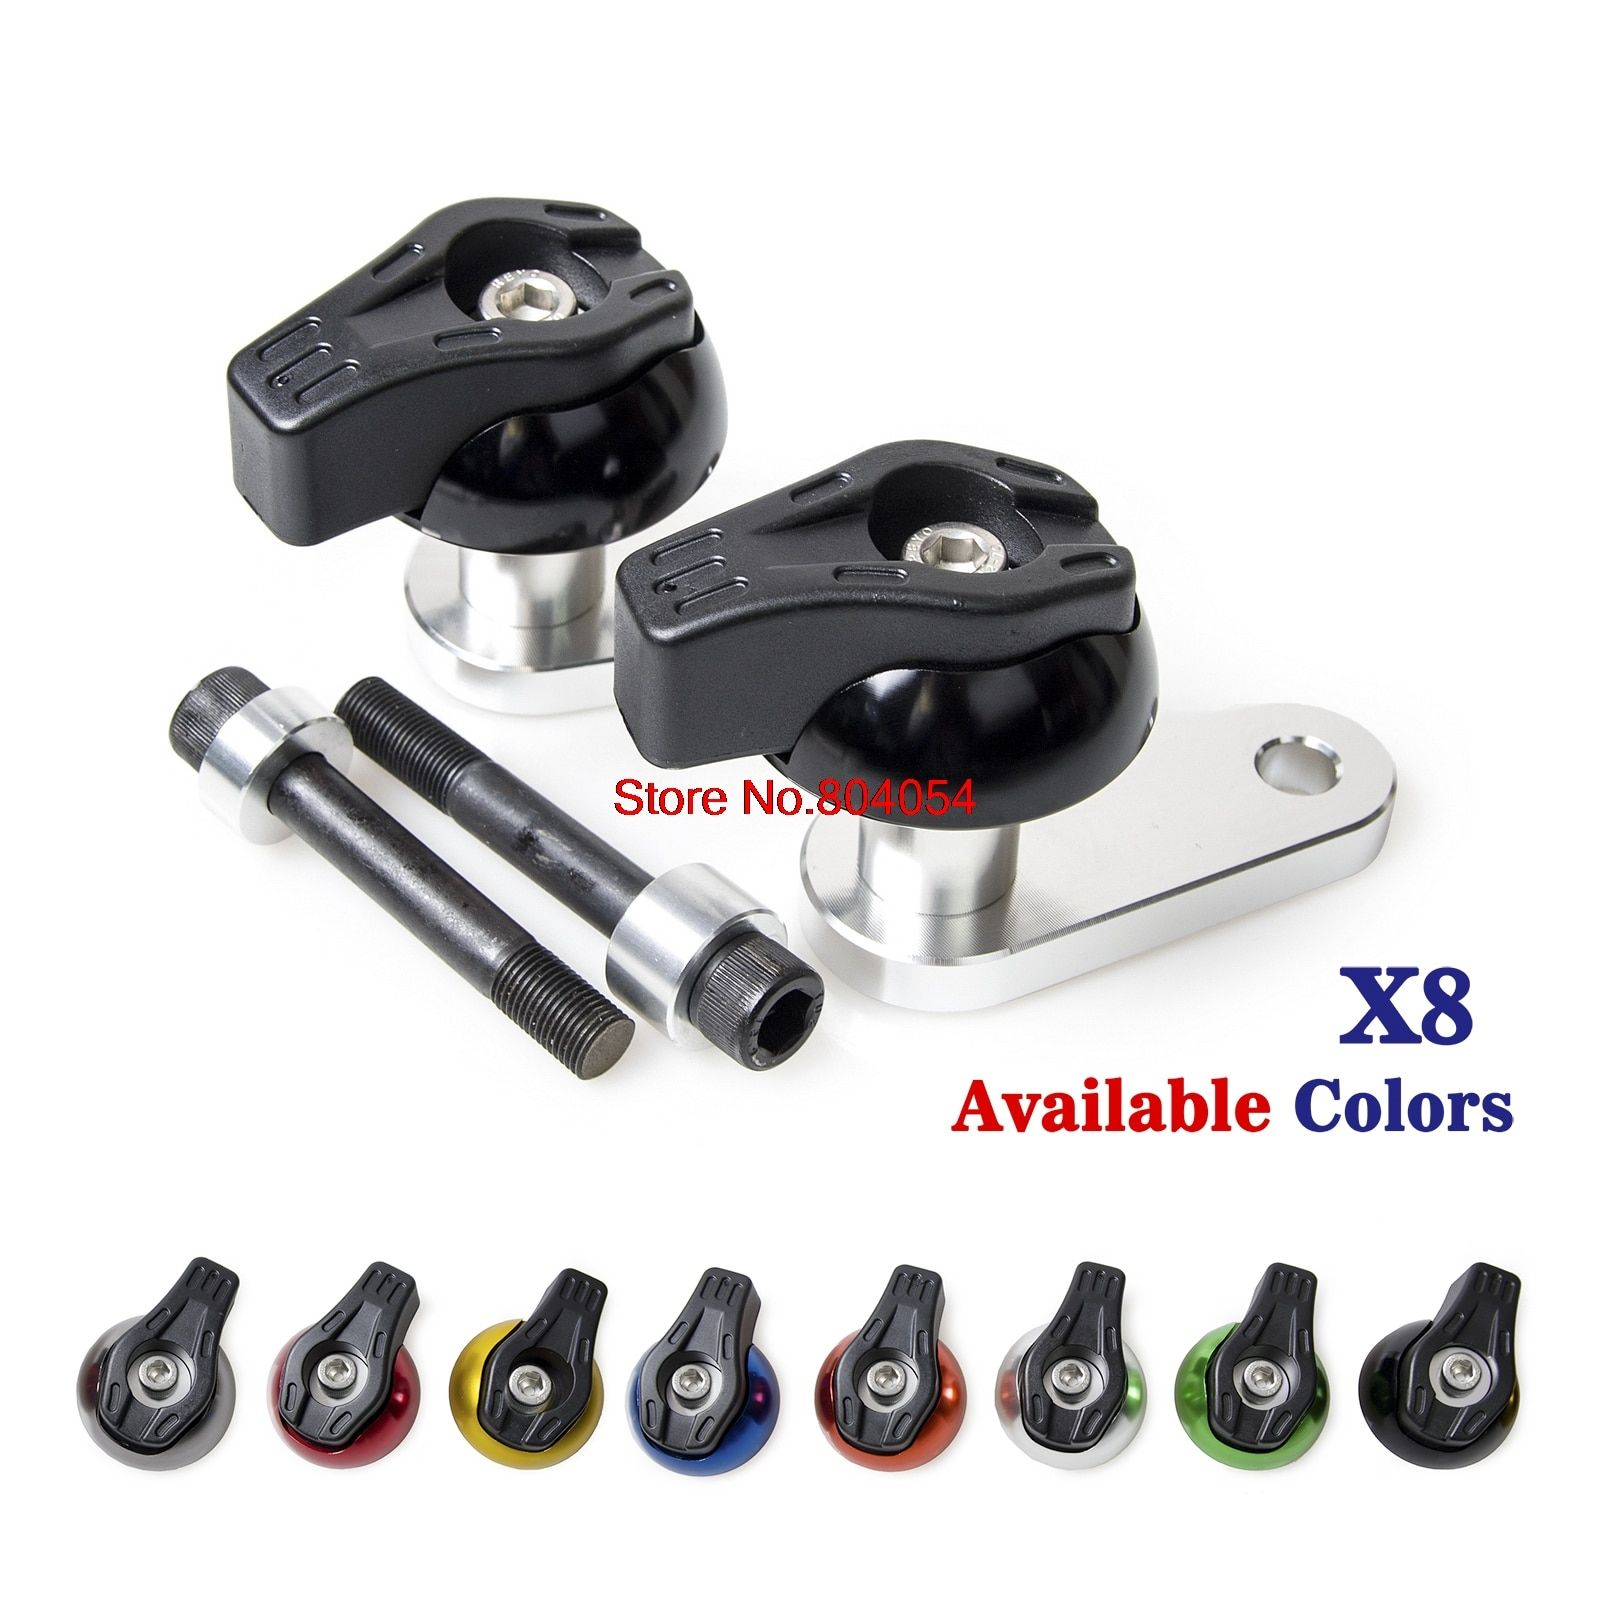 CNC Aluminium Frame Sliders Crash Pads Left Right For Honda CBR1000RR 2004 2005 CBR1000 RR CBR 1000RR 04 05 NEW